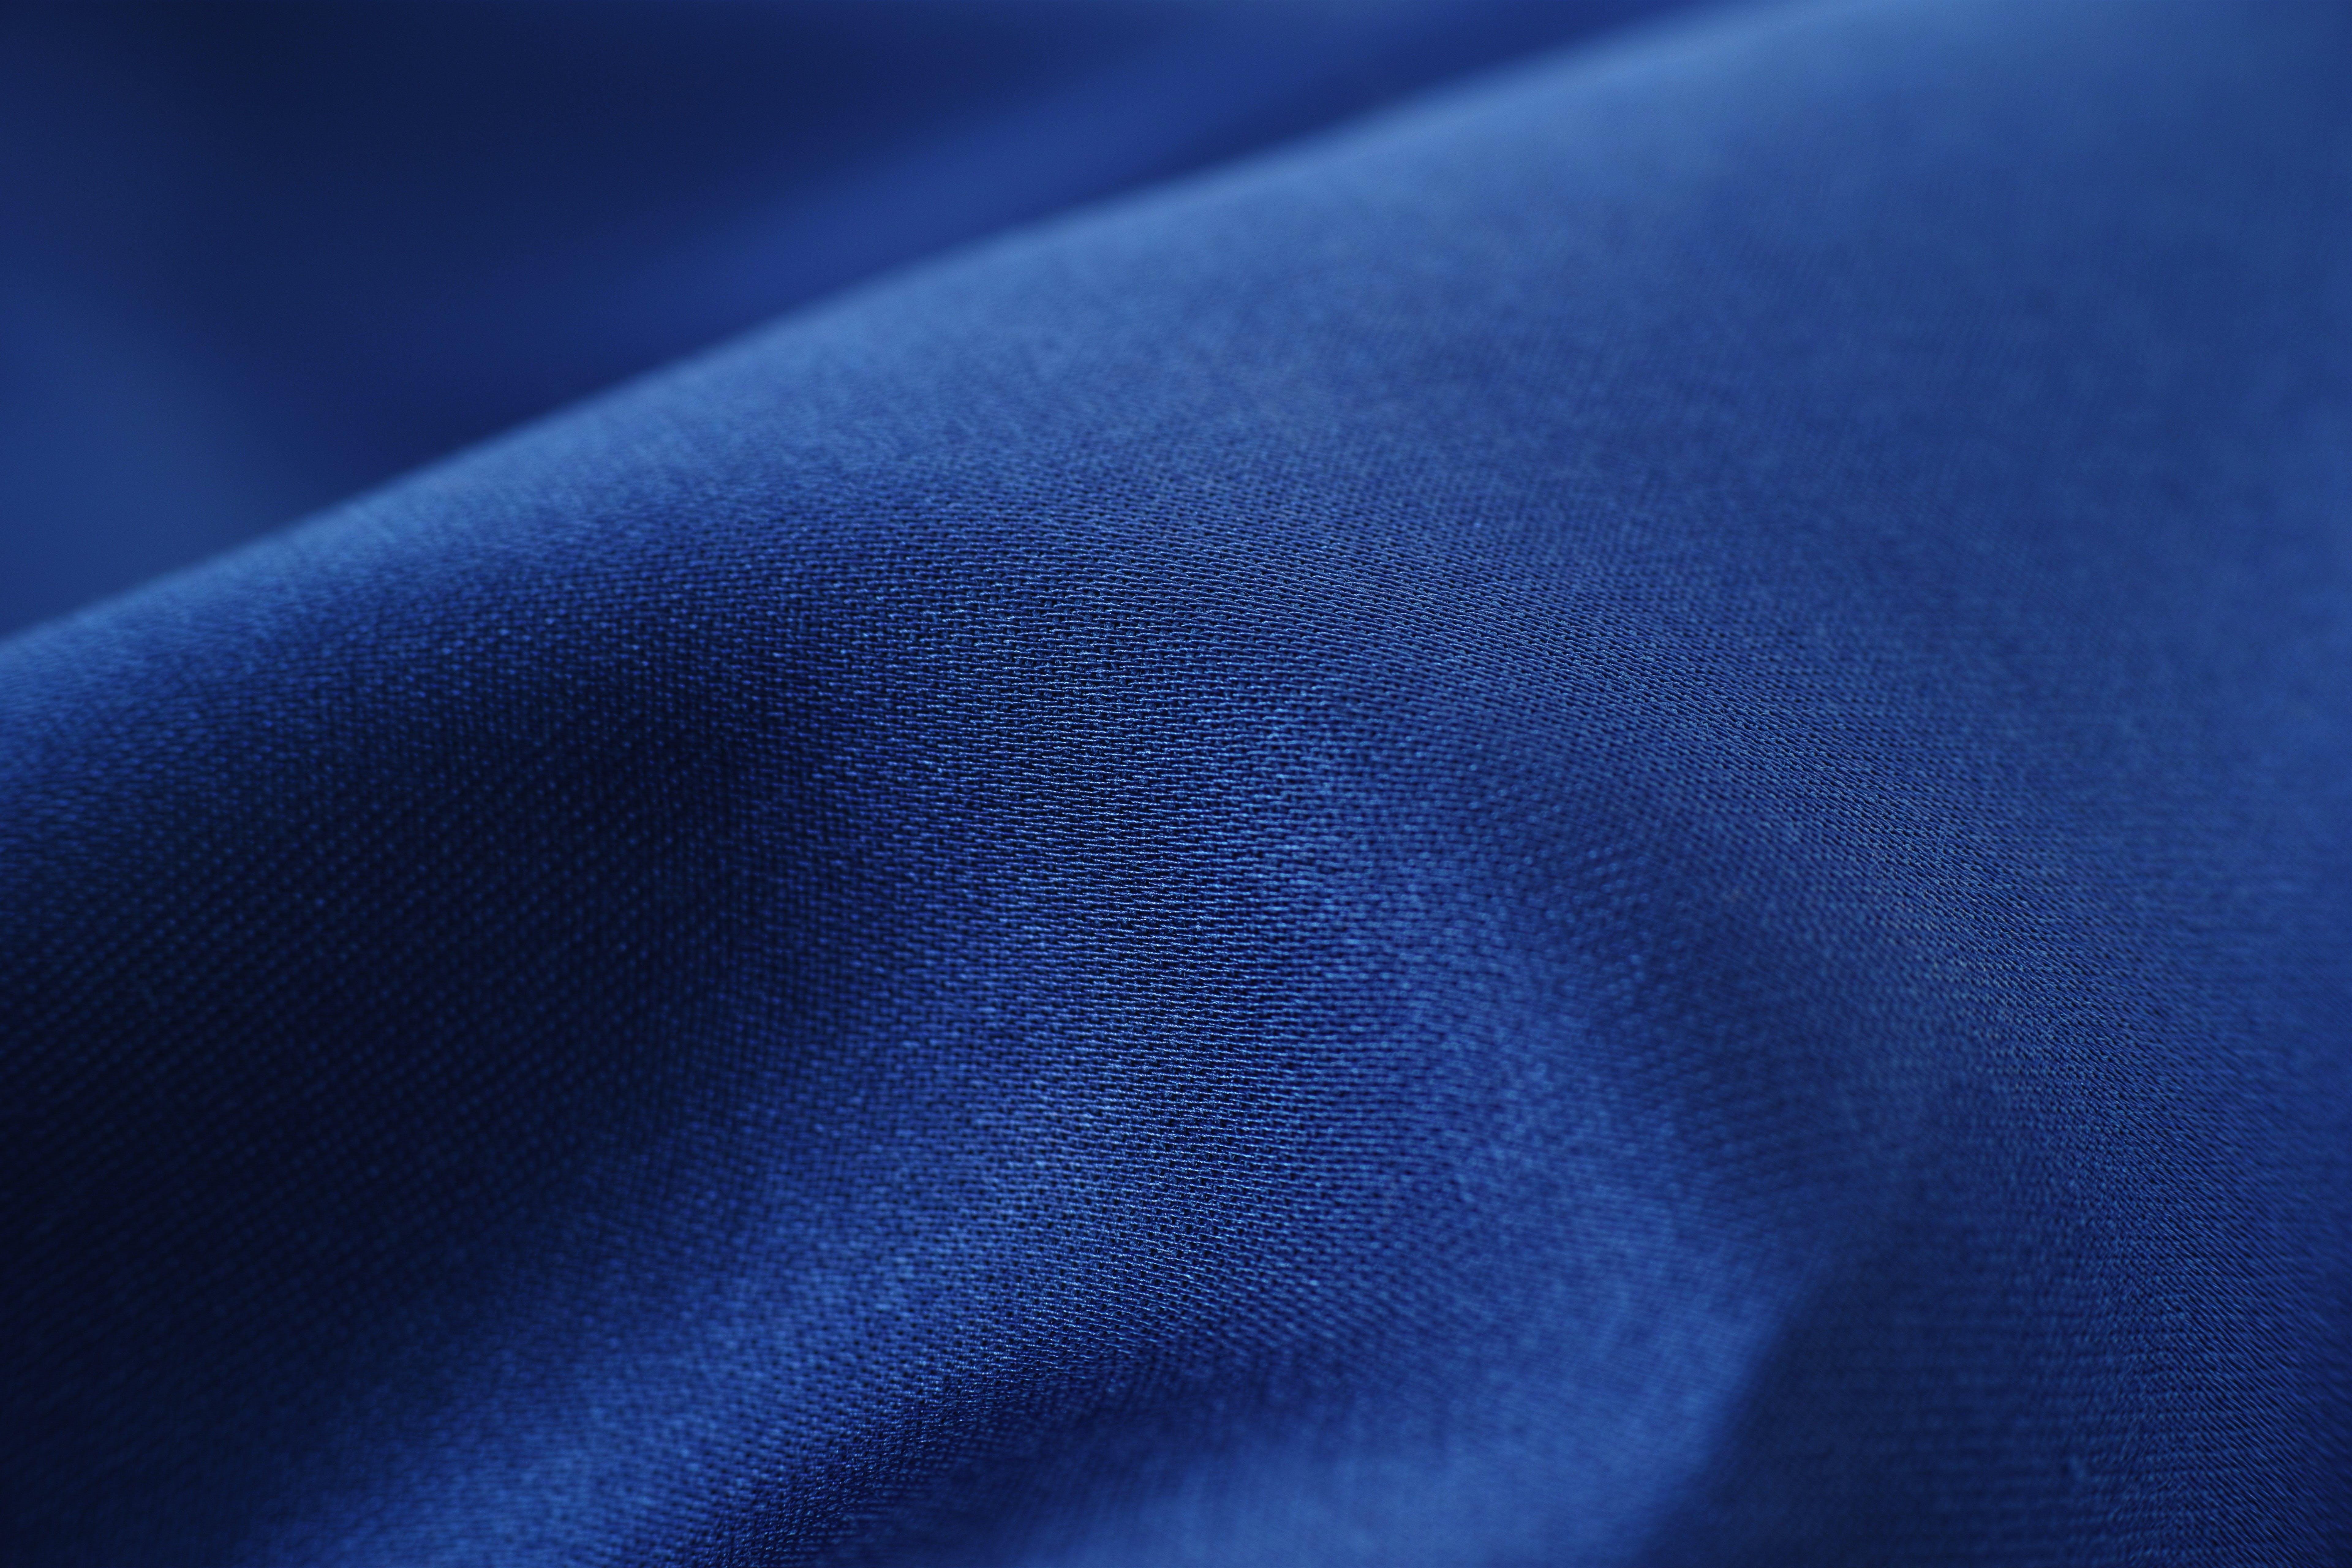 Free stock photo of fashion, blue, pattern, texture